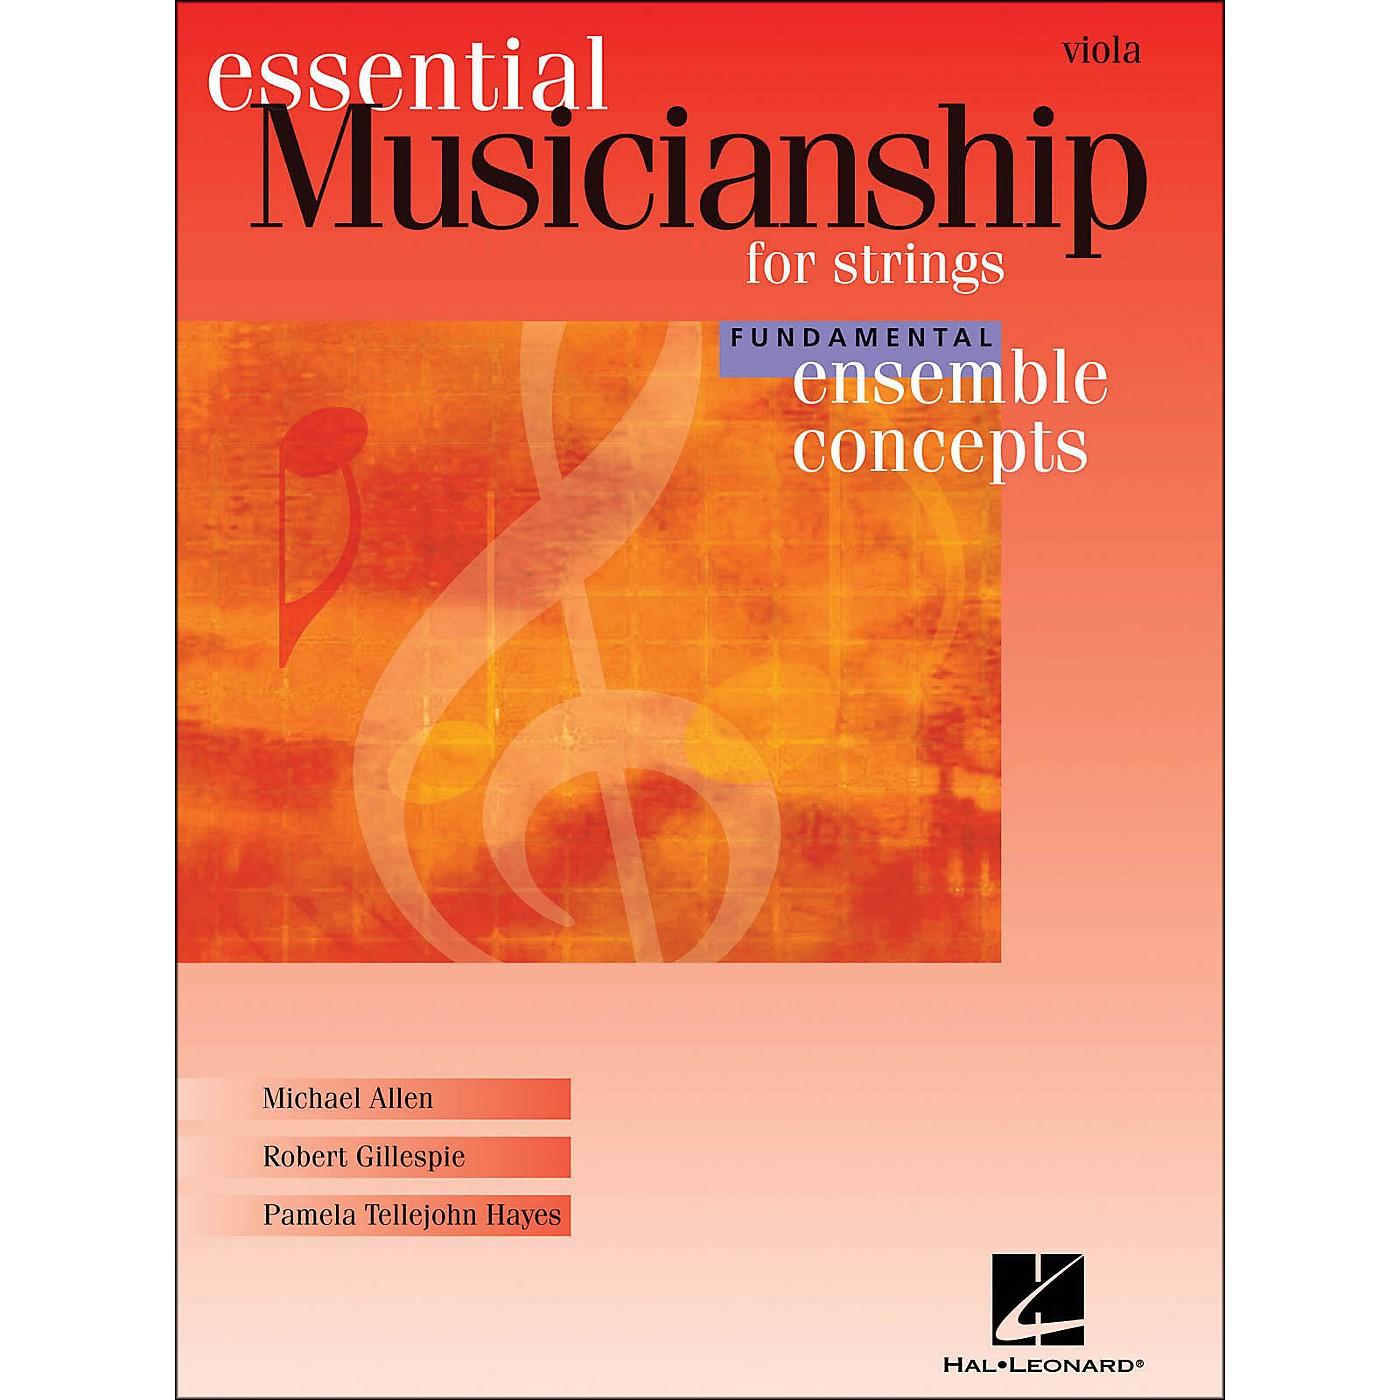 Hal Leonard Essential Musicianship for Strings - Ensemble Concepts Fundamental Viola thumbnail